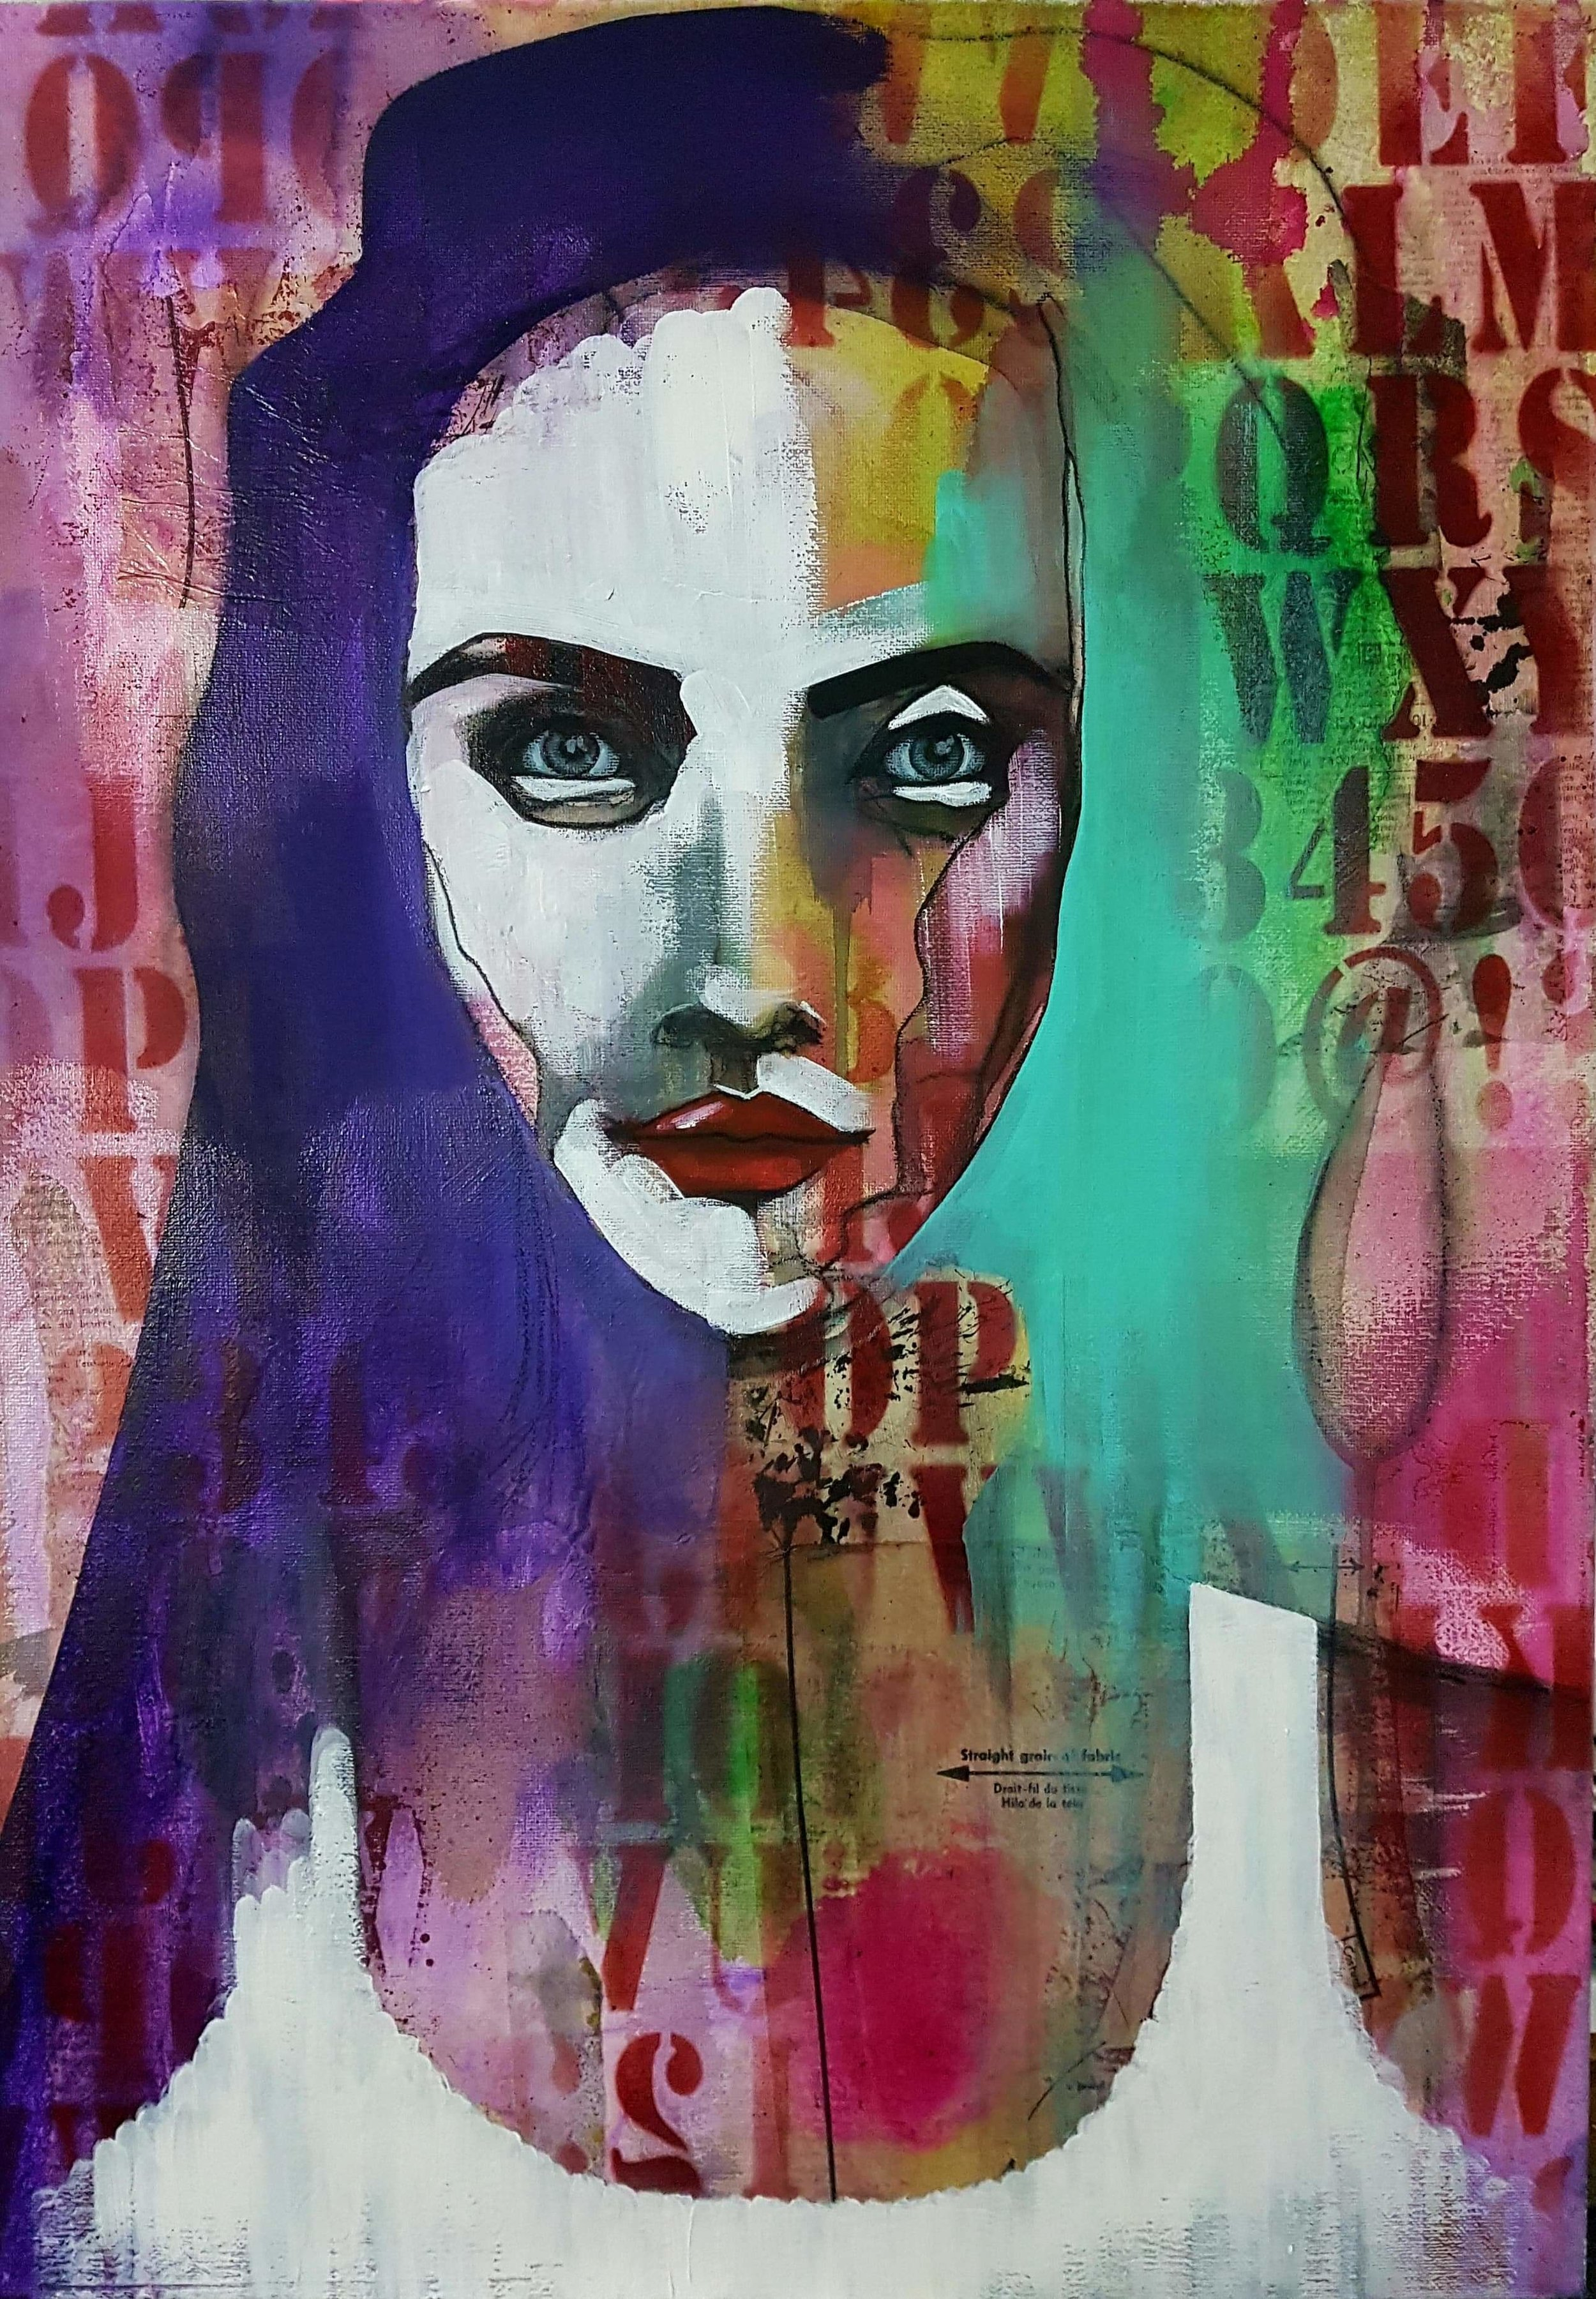 Mixed media artist Muriel Stegers